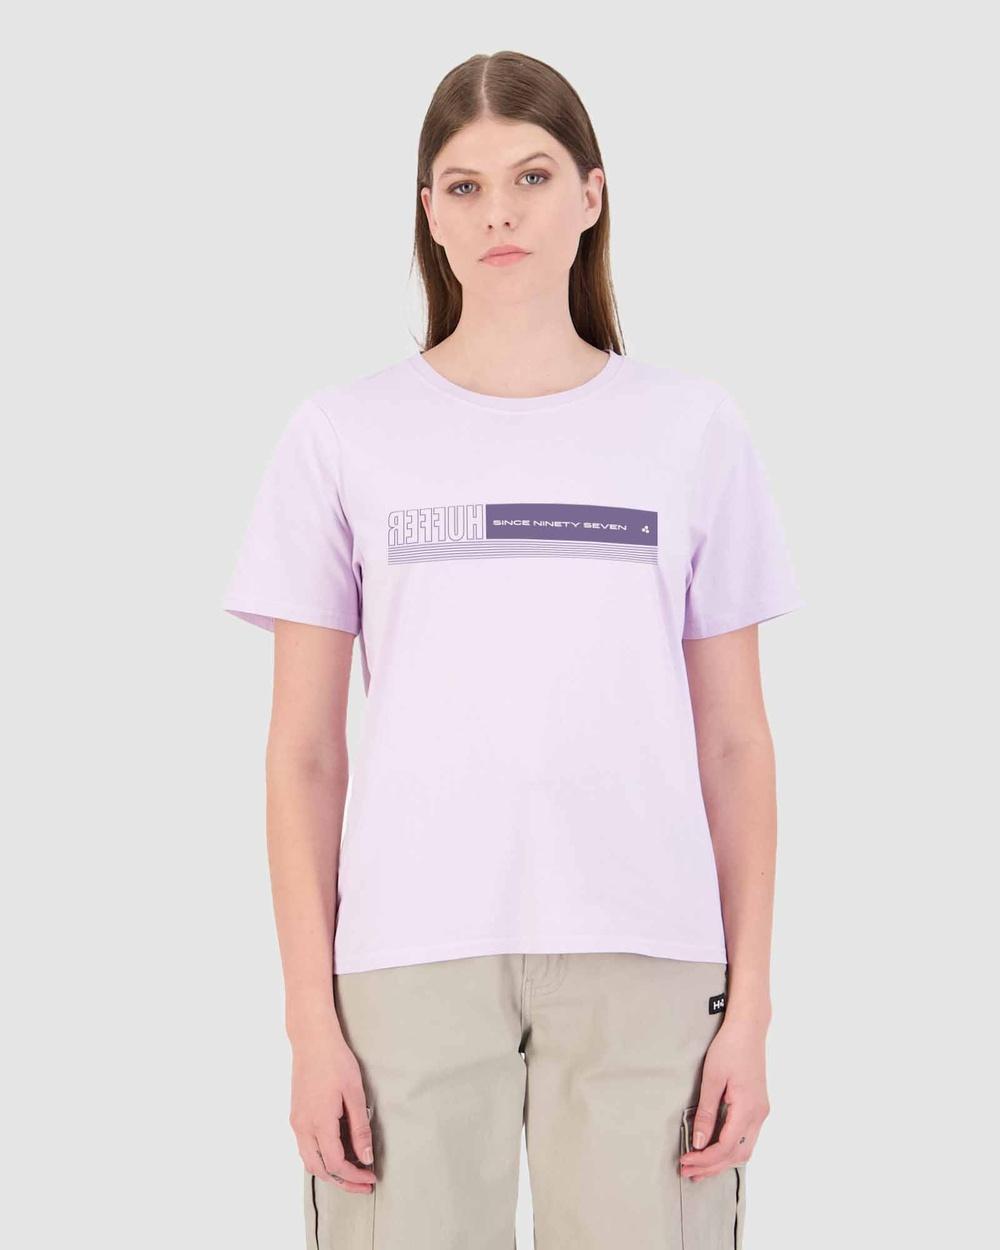 Huffer Women's Stella Tee Sidestage T-Shirts & Singlets Purple Tee-Sidestage